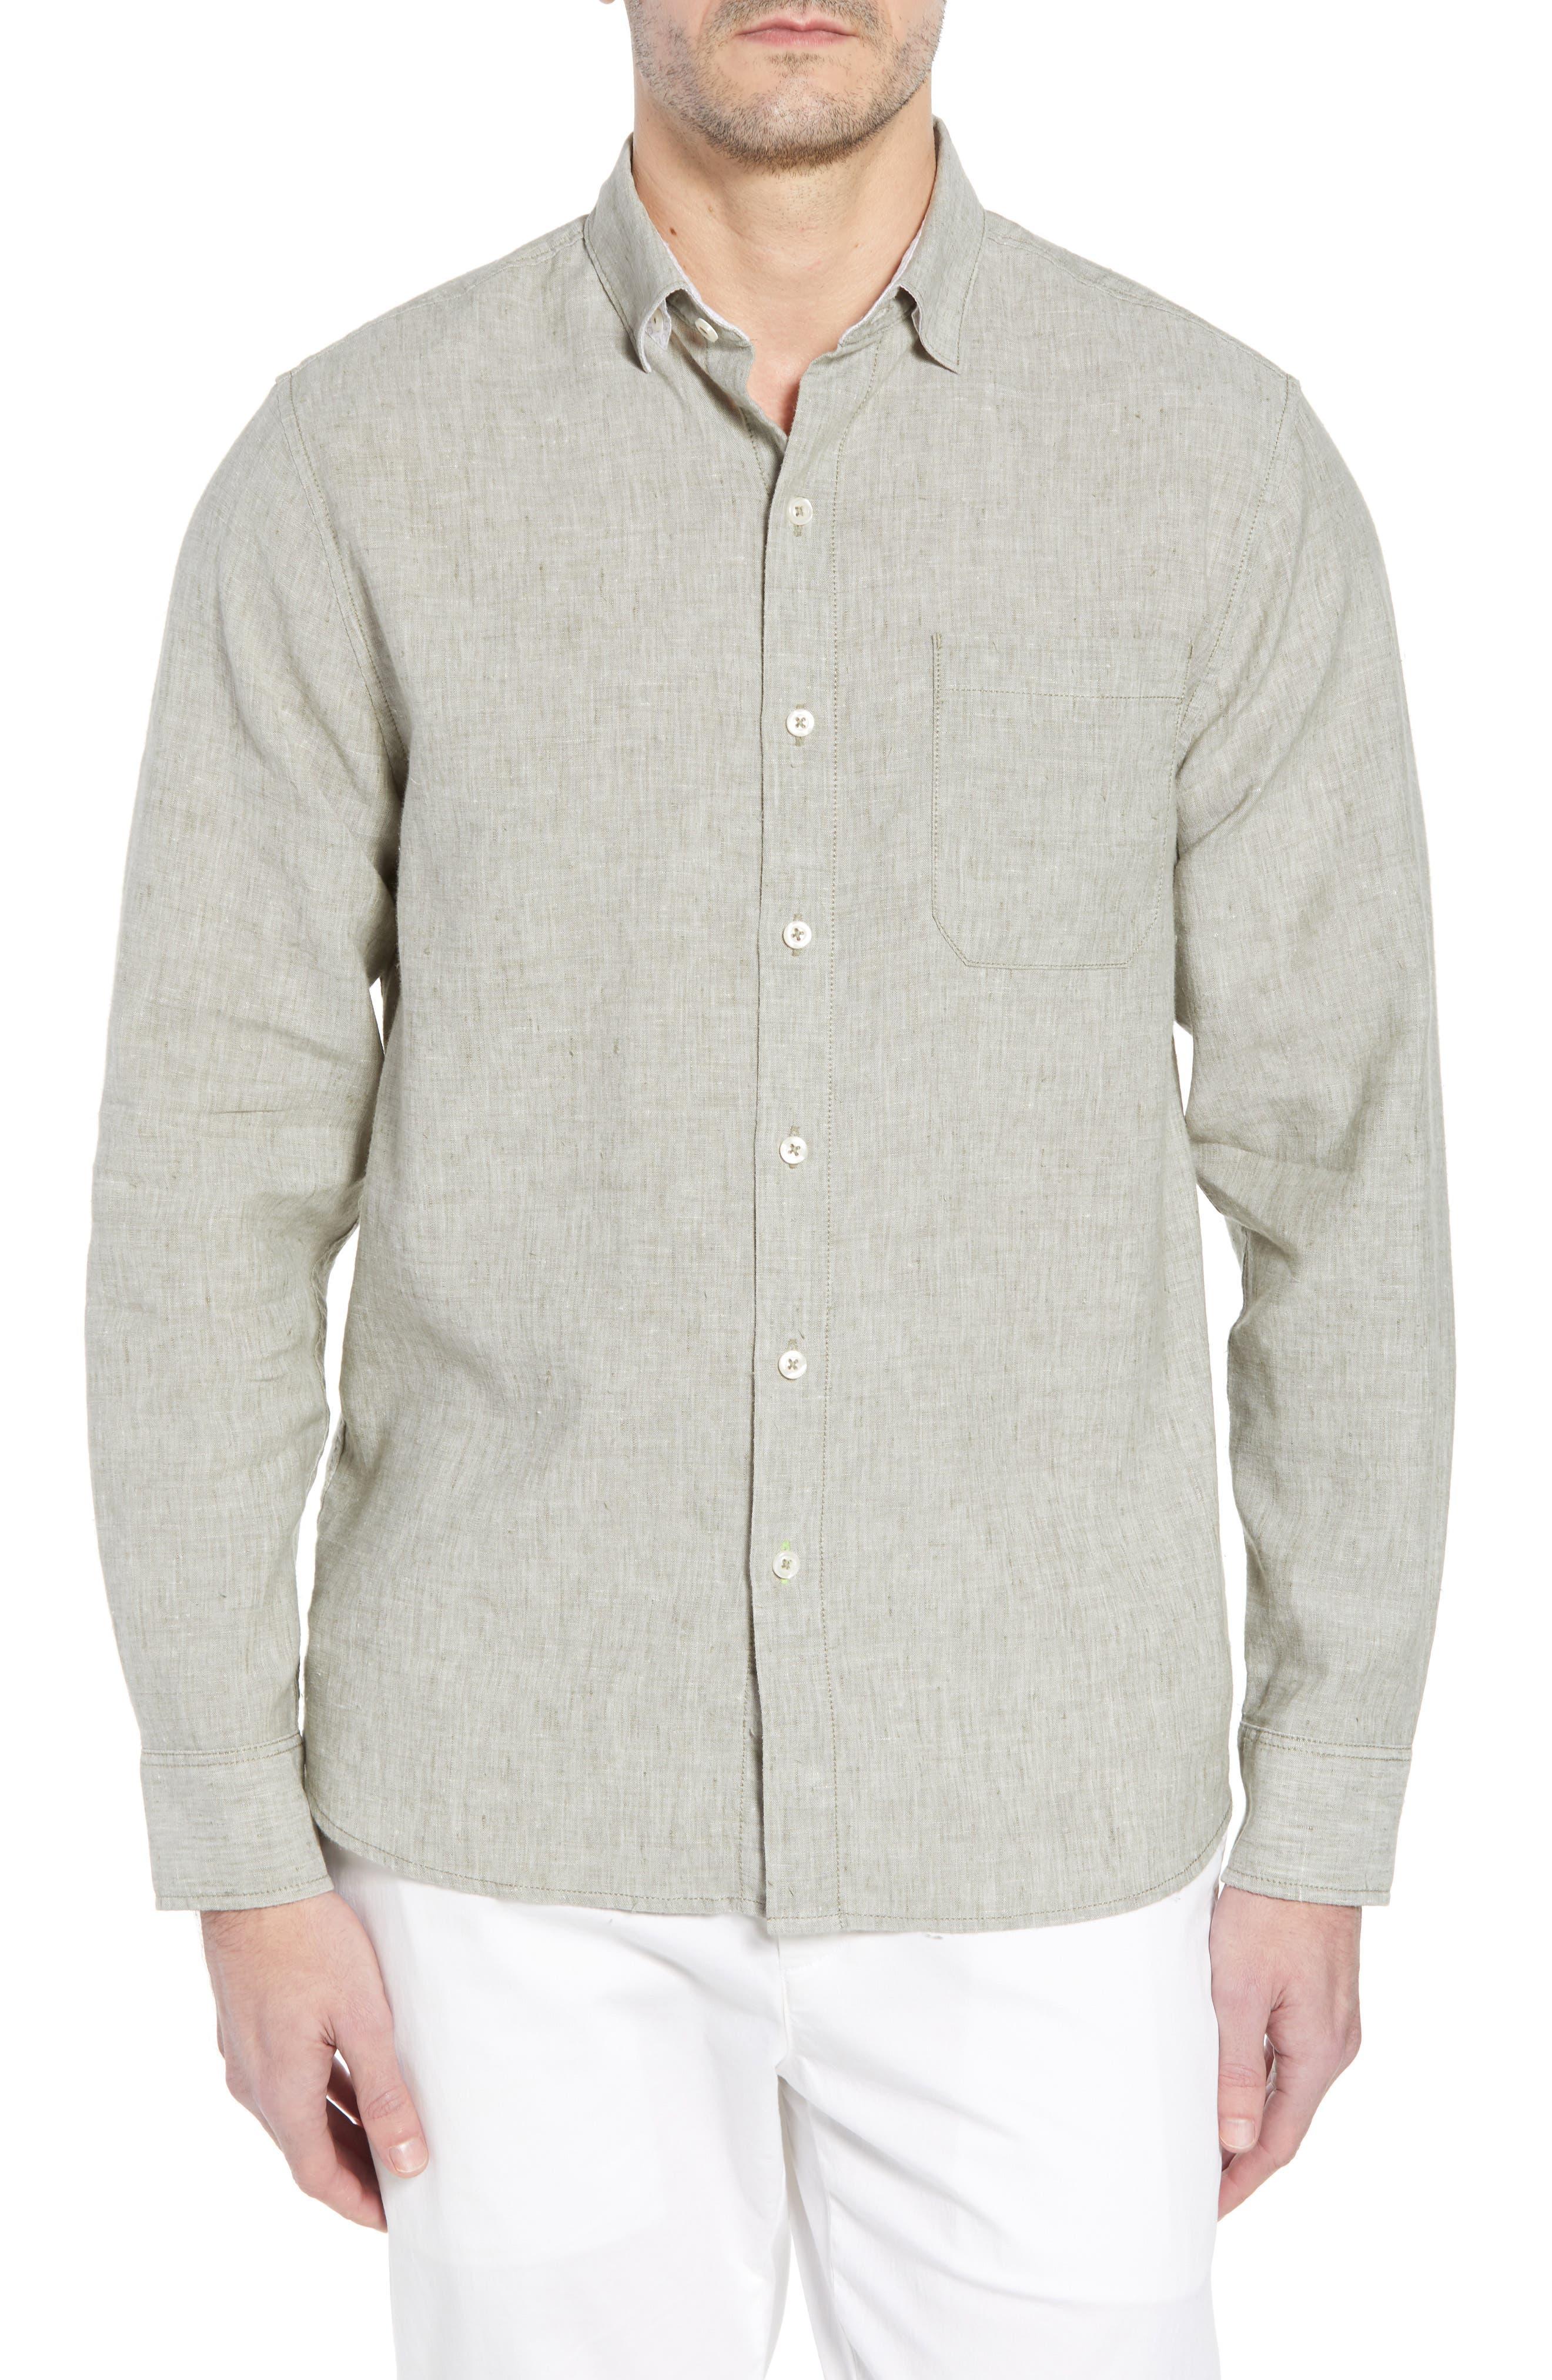 Main Image - Tommy Bahama Lanai Tides Regular Fit Linen Blend Sport Shirt